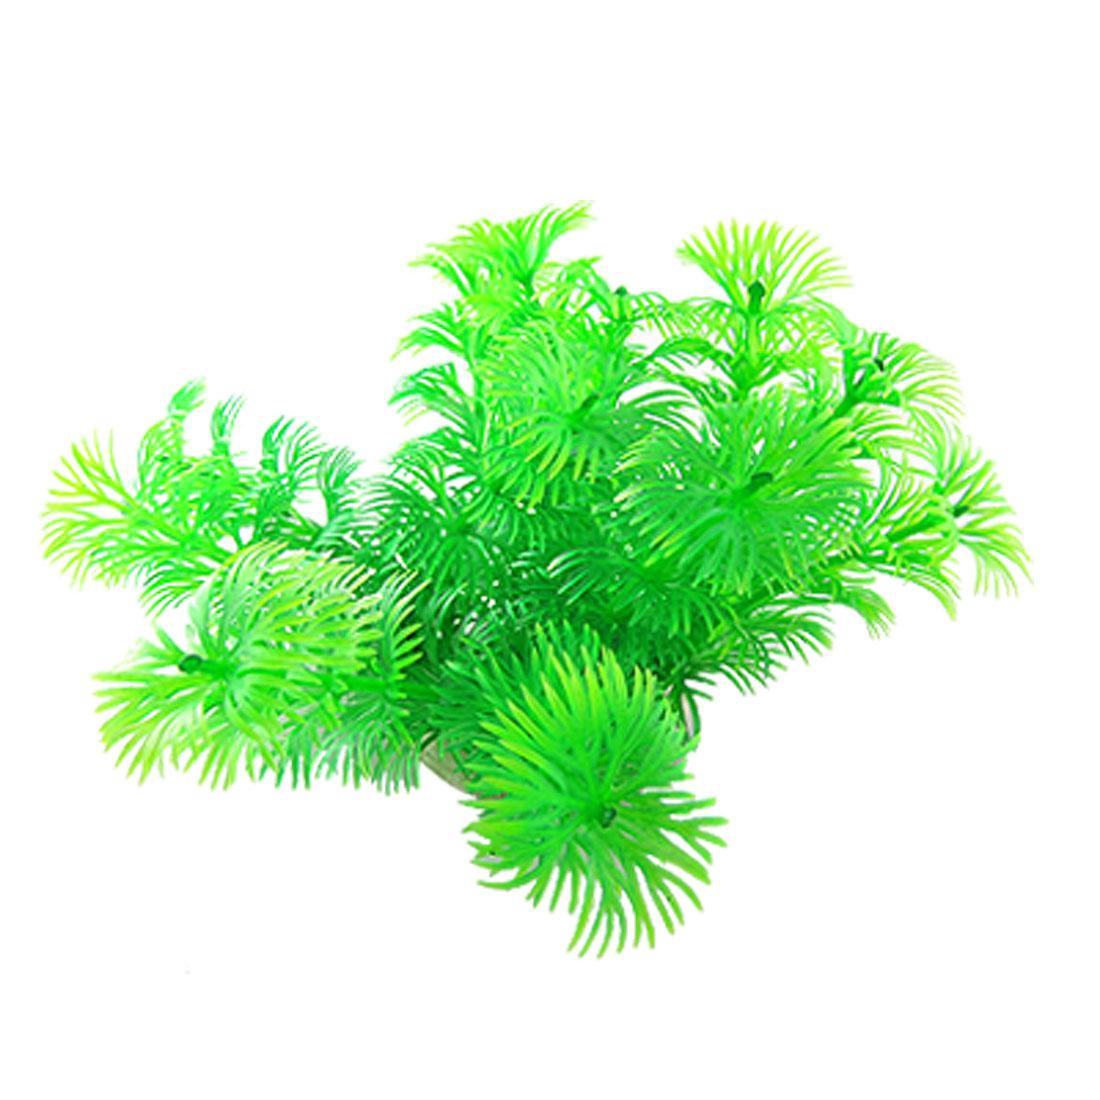 Hard Plastic Plant Aquarium Tank Ornament Grass